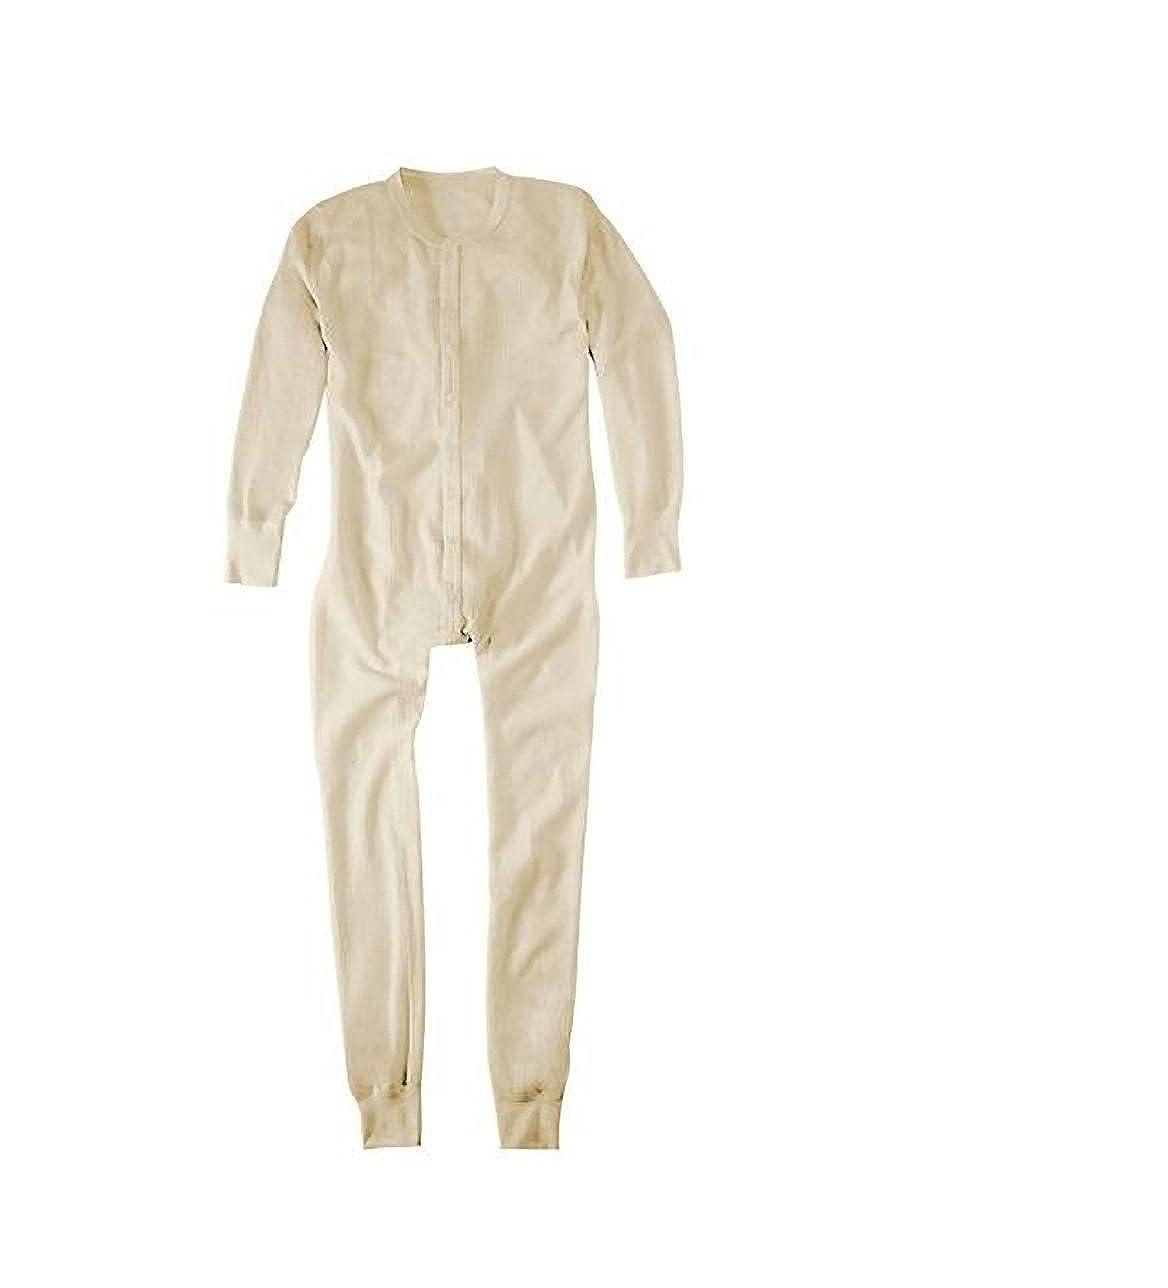 Hanes 22806 Mens Thermal Union Suit